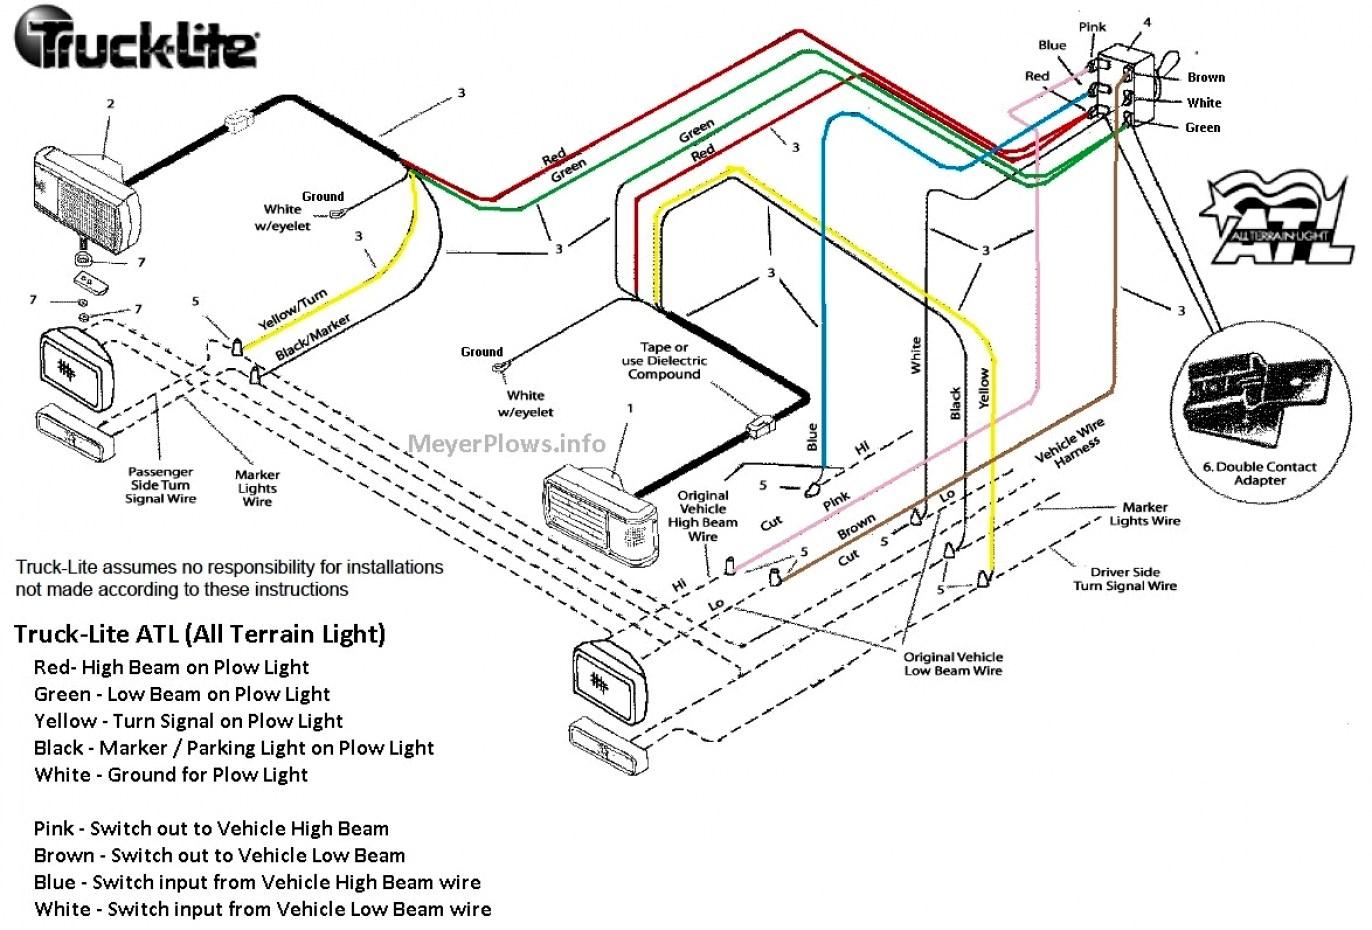 Northman Snow Plow Wiring Diagram - Today Wiring Diagram - Meyer Snow Plow Wiring Diagram